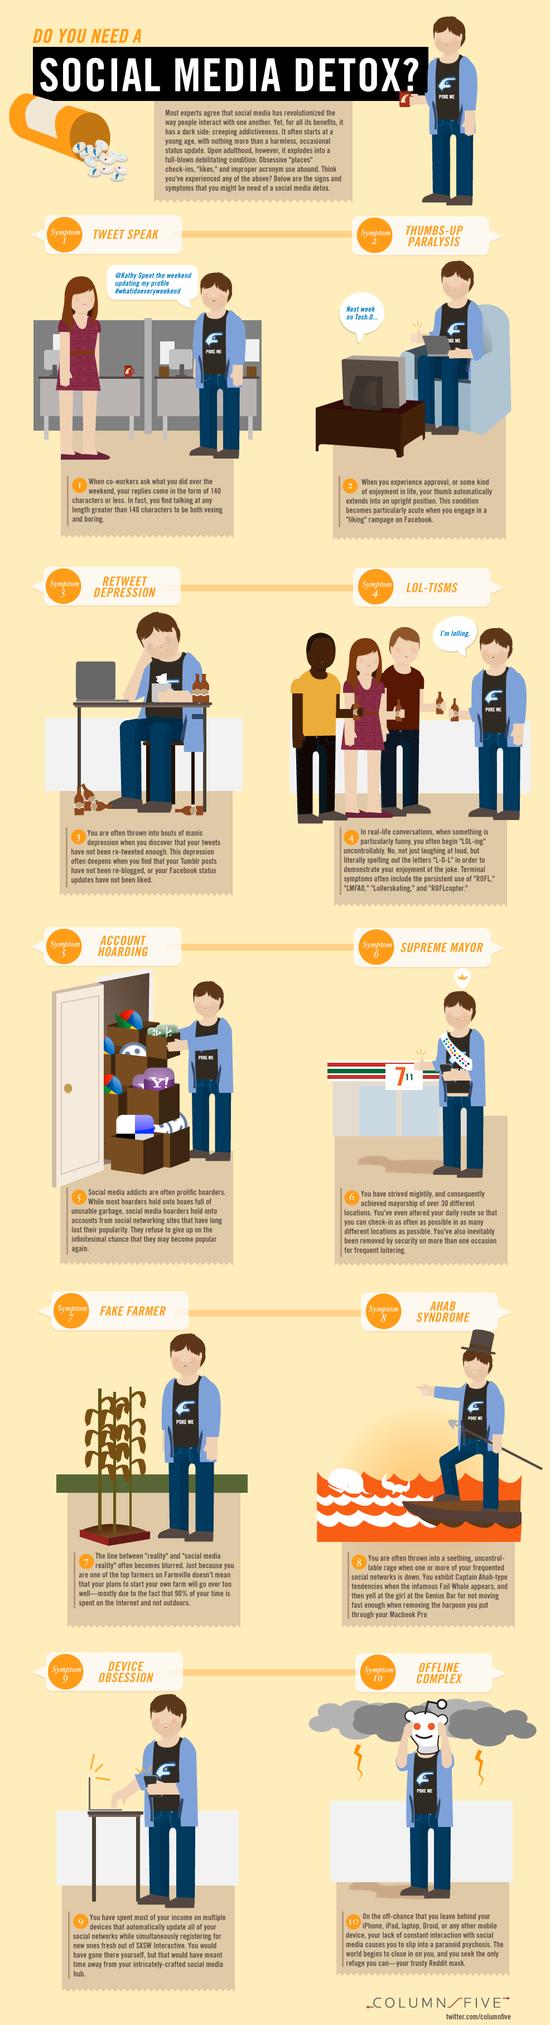 Infographic - Do You Need A Social Media Detox